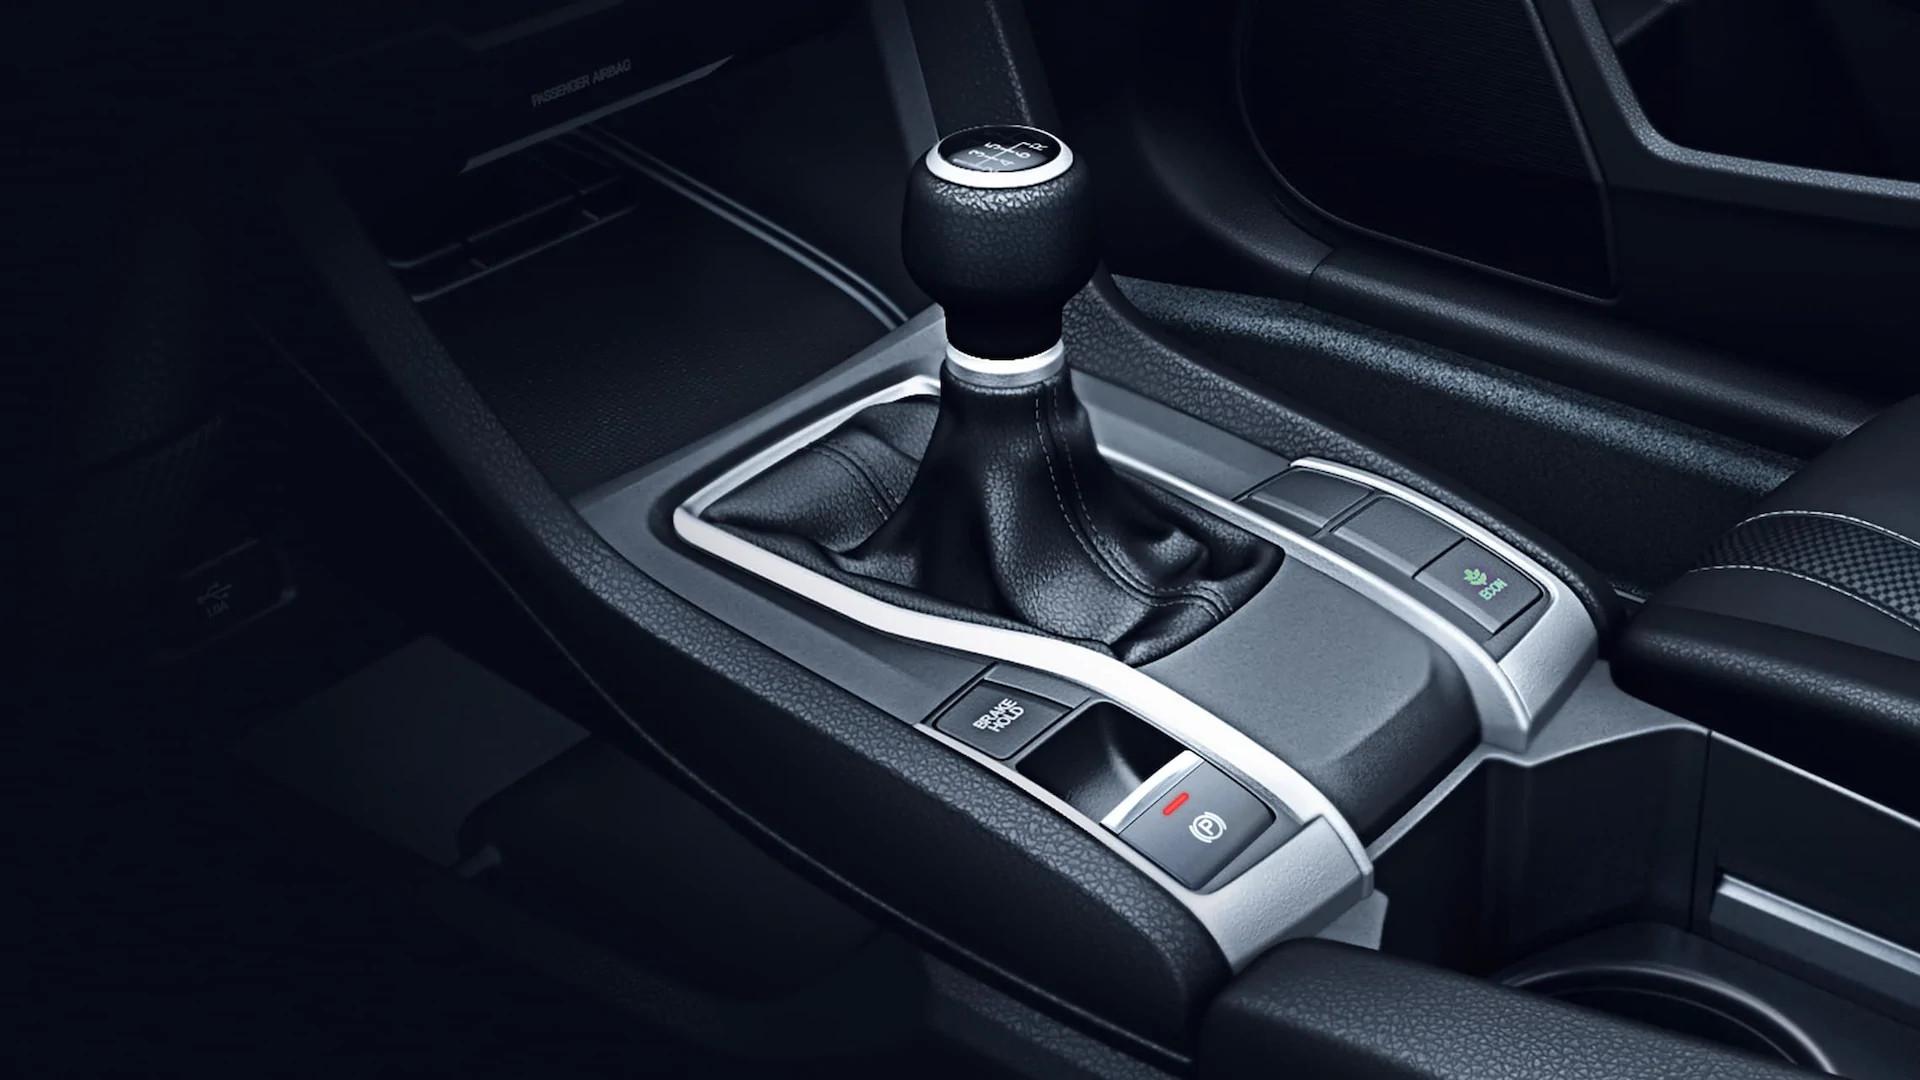 Take Command of the 2020 Honda Civic